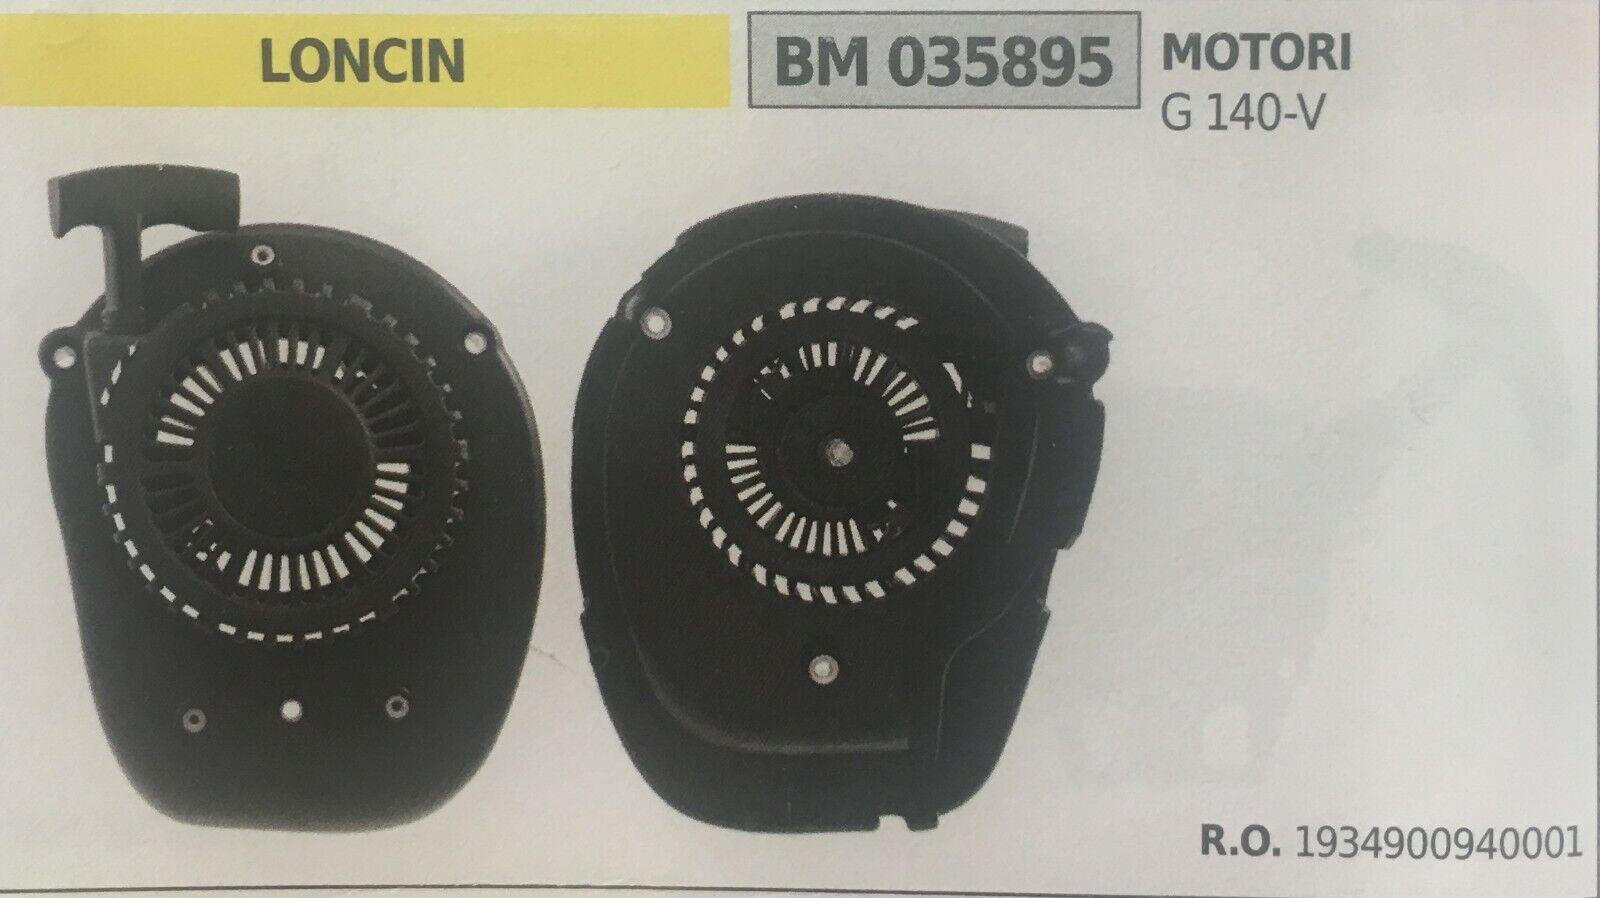 AVVIAMENTO COMPLETO BRUMAR LONCIN BM035895